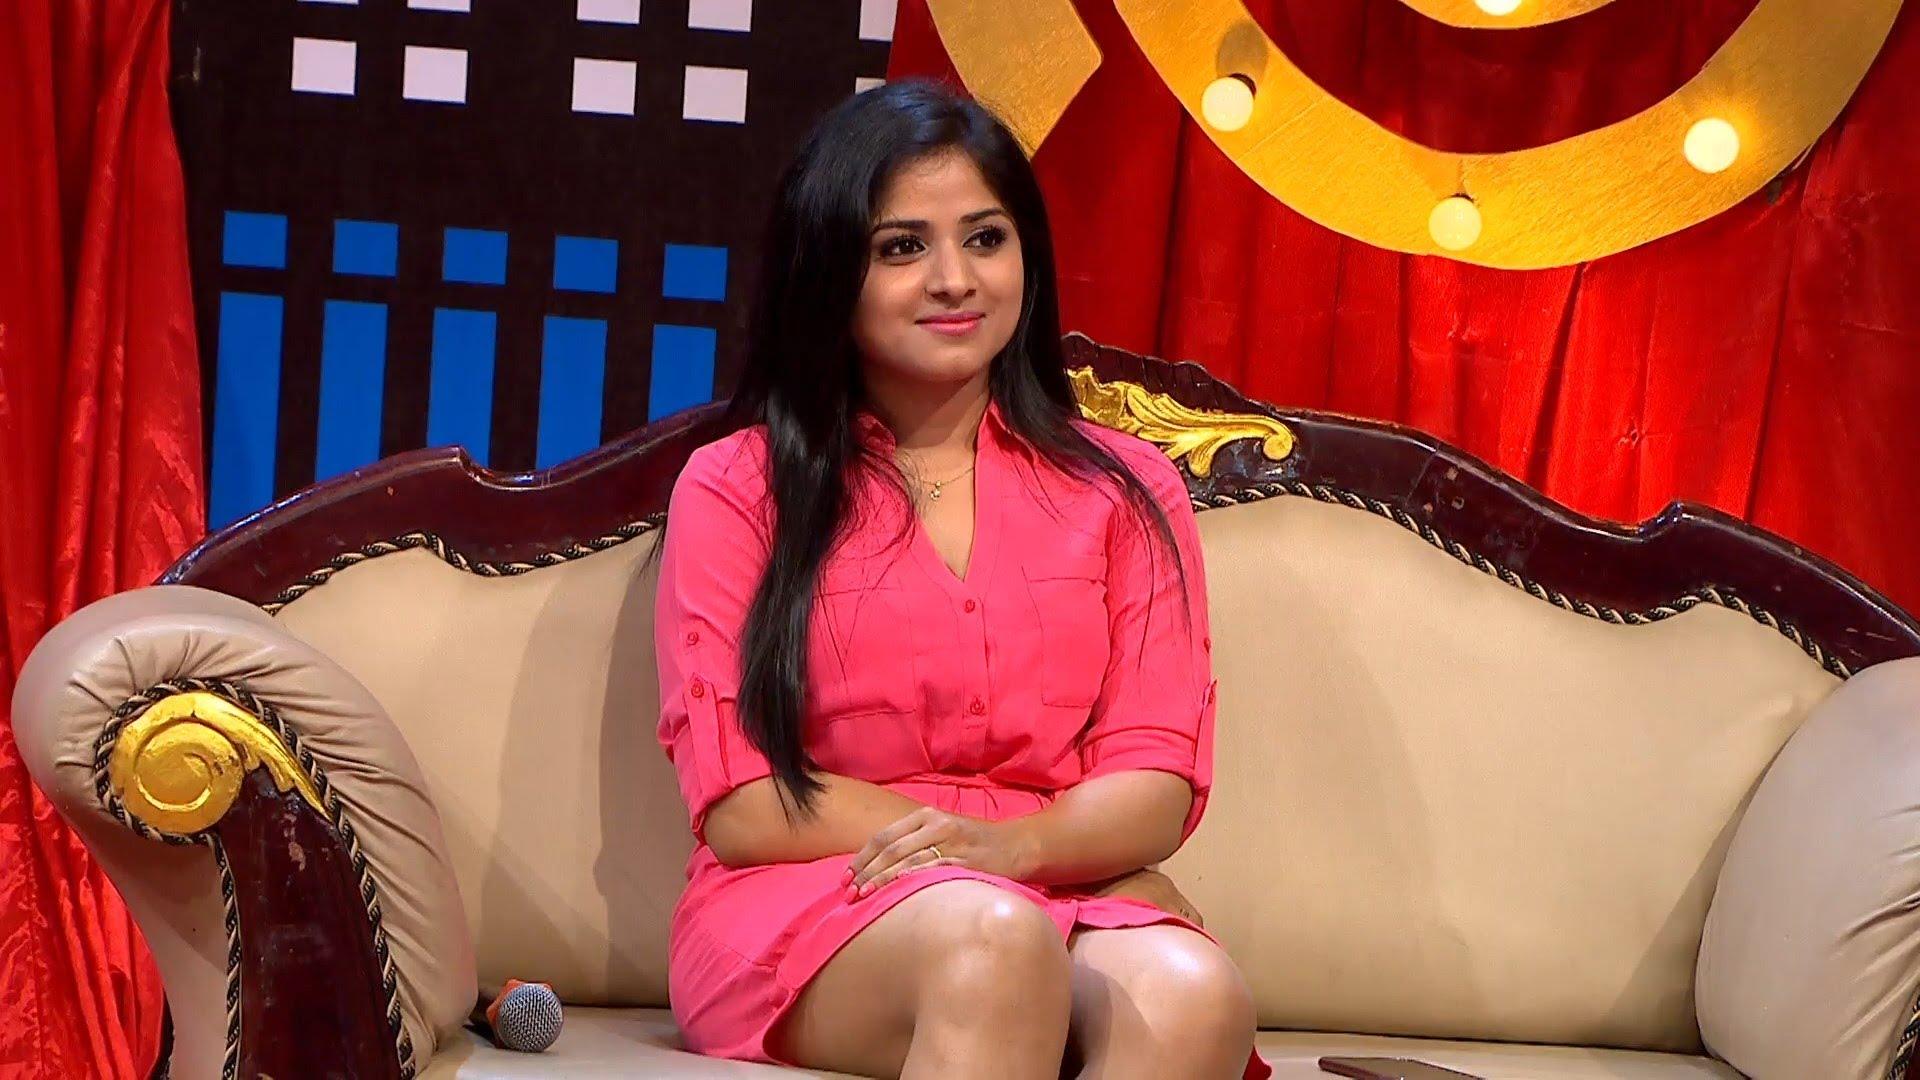 Hot Looking Actress Chandini Sreedharan in MGR Pandian Movie